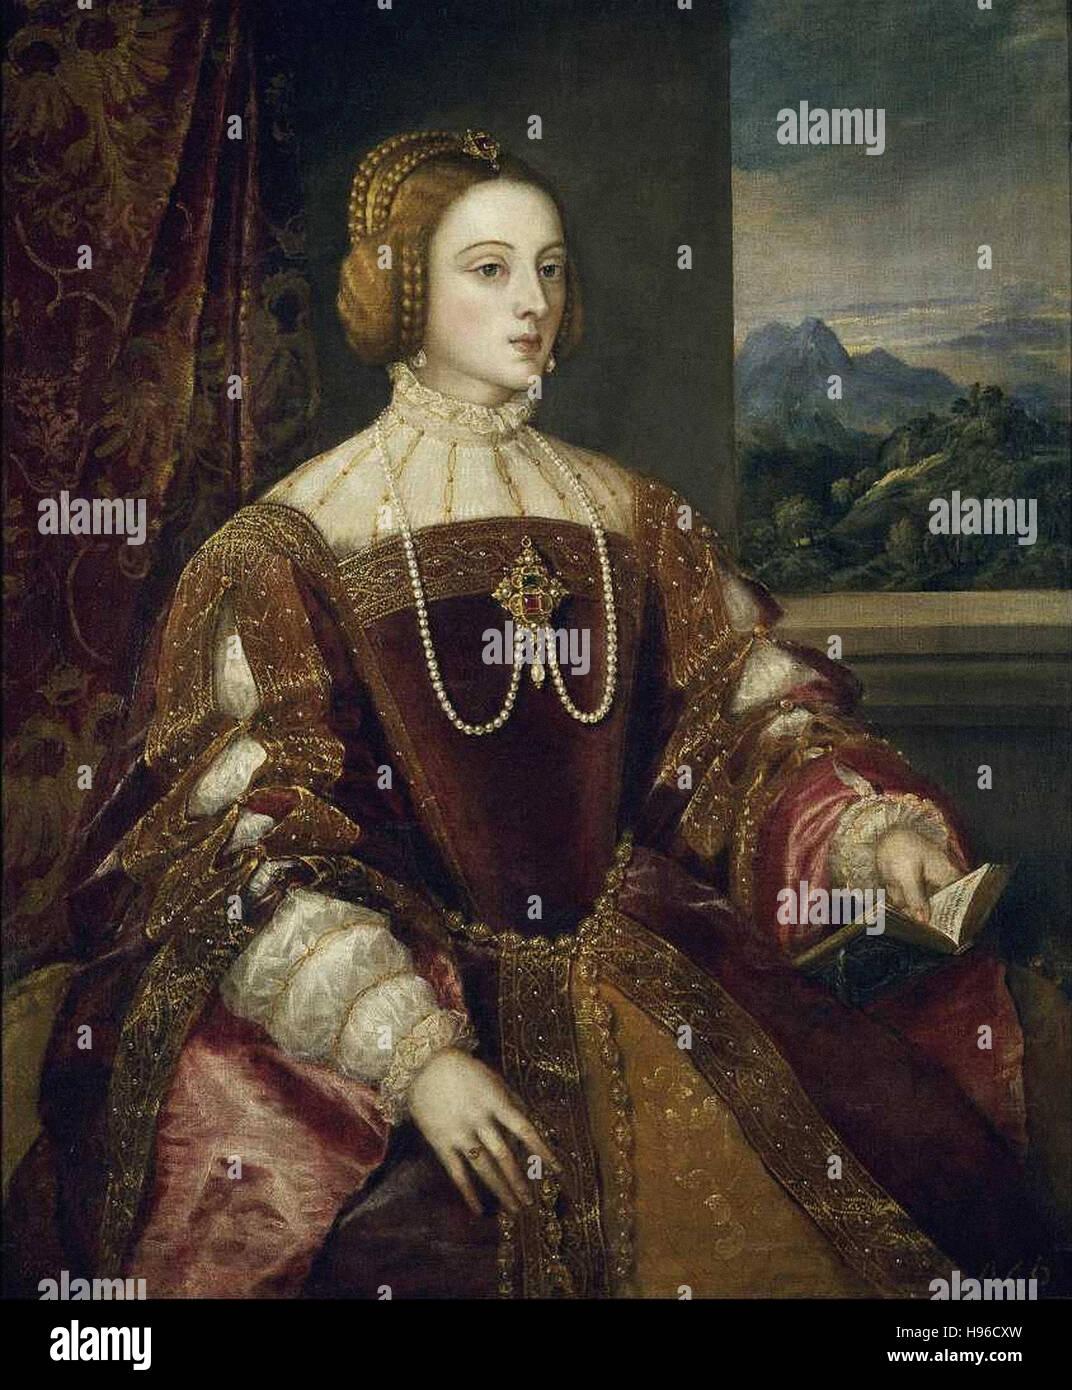 Tiziano Vecellio - Le Titien  - The empress Isabelle of  Portugal - 1548 - - Stock Image